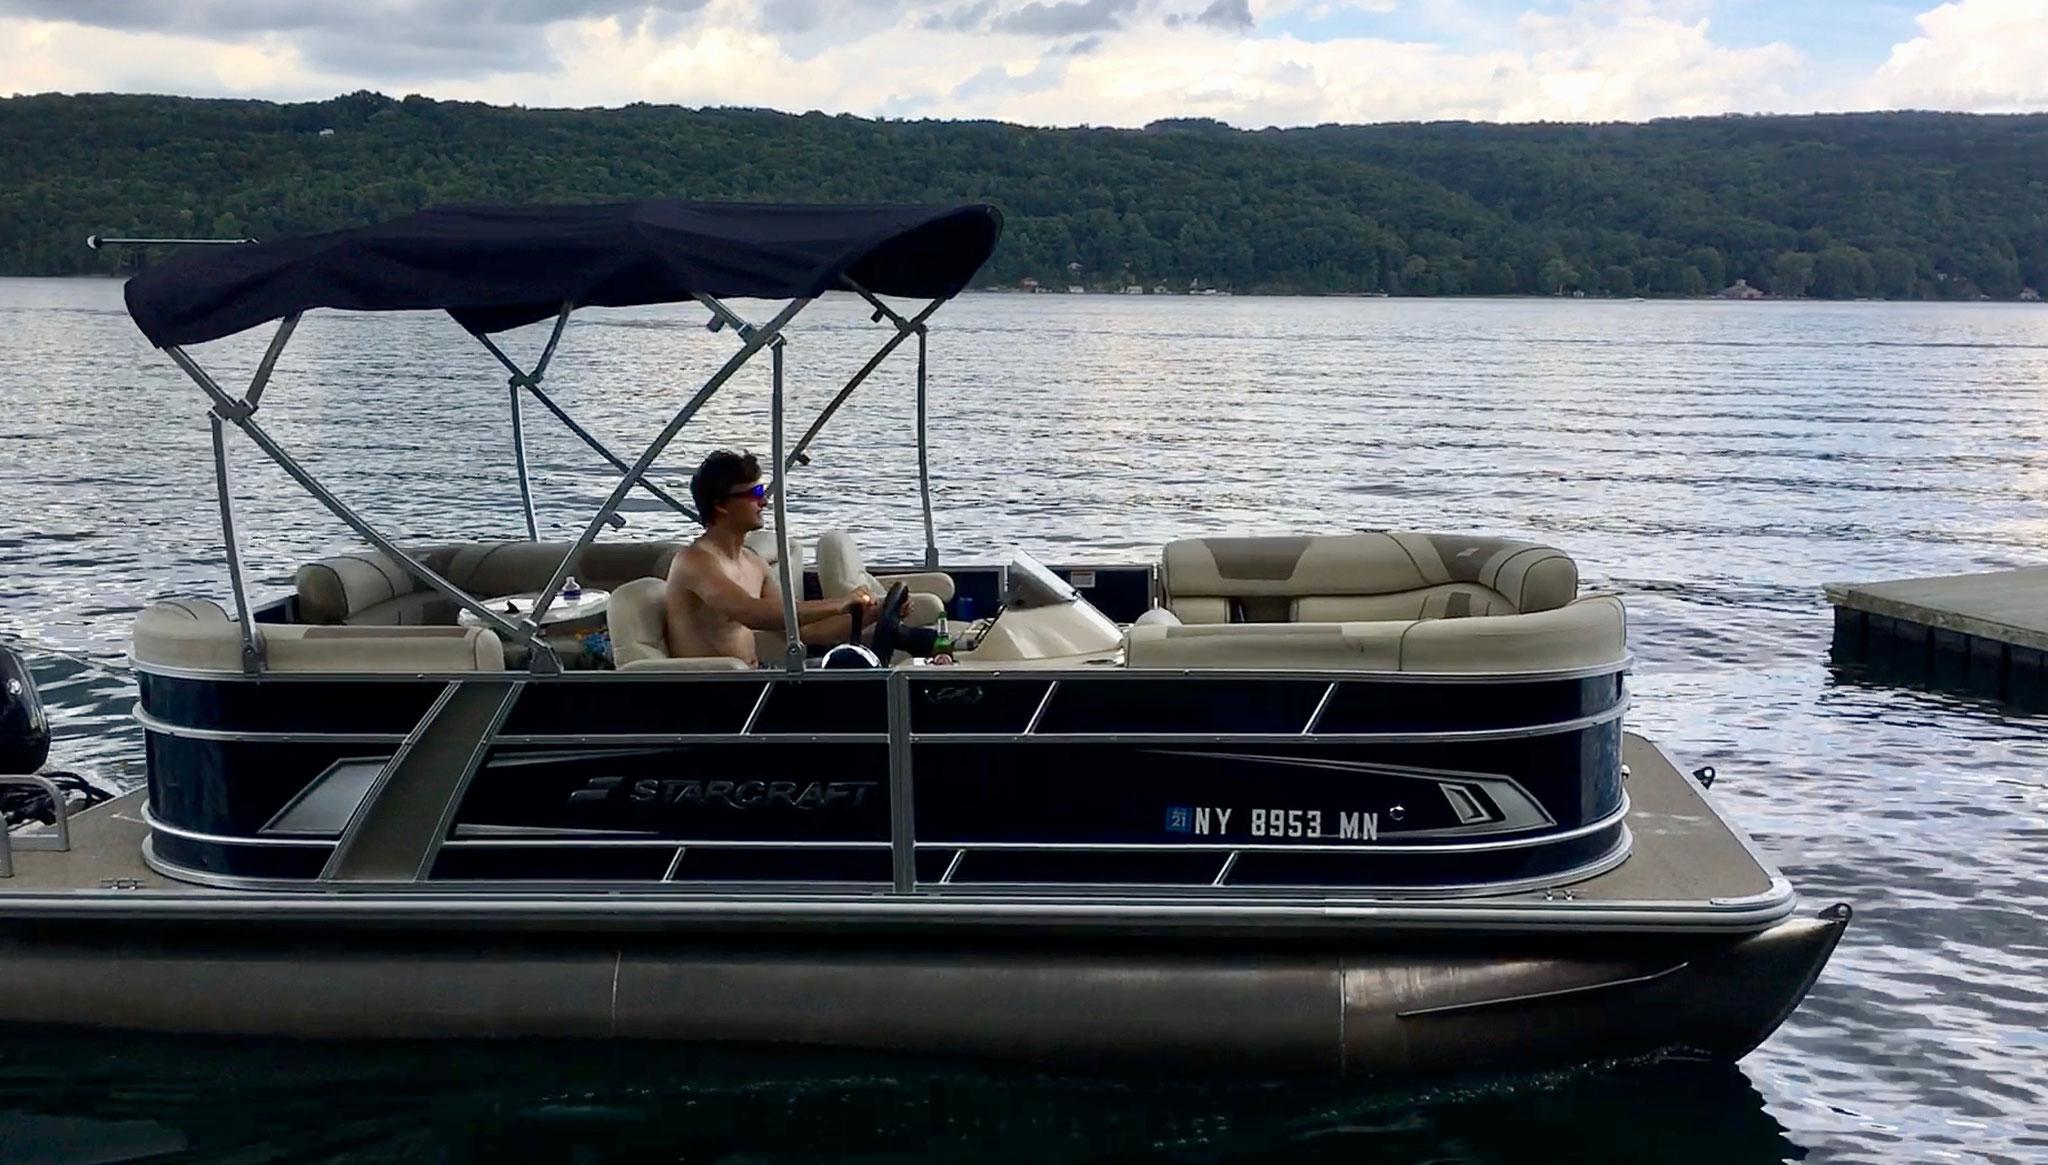 Jack drives the new pontoon boat